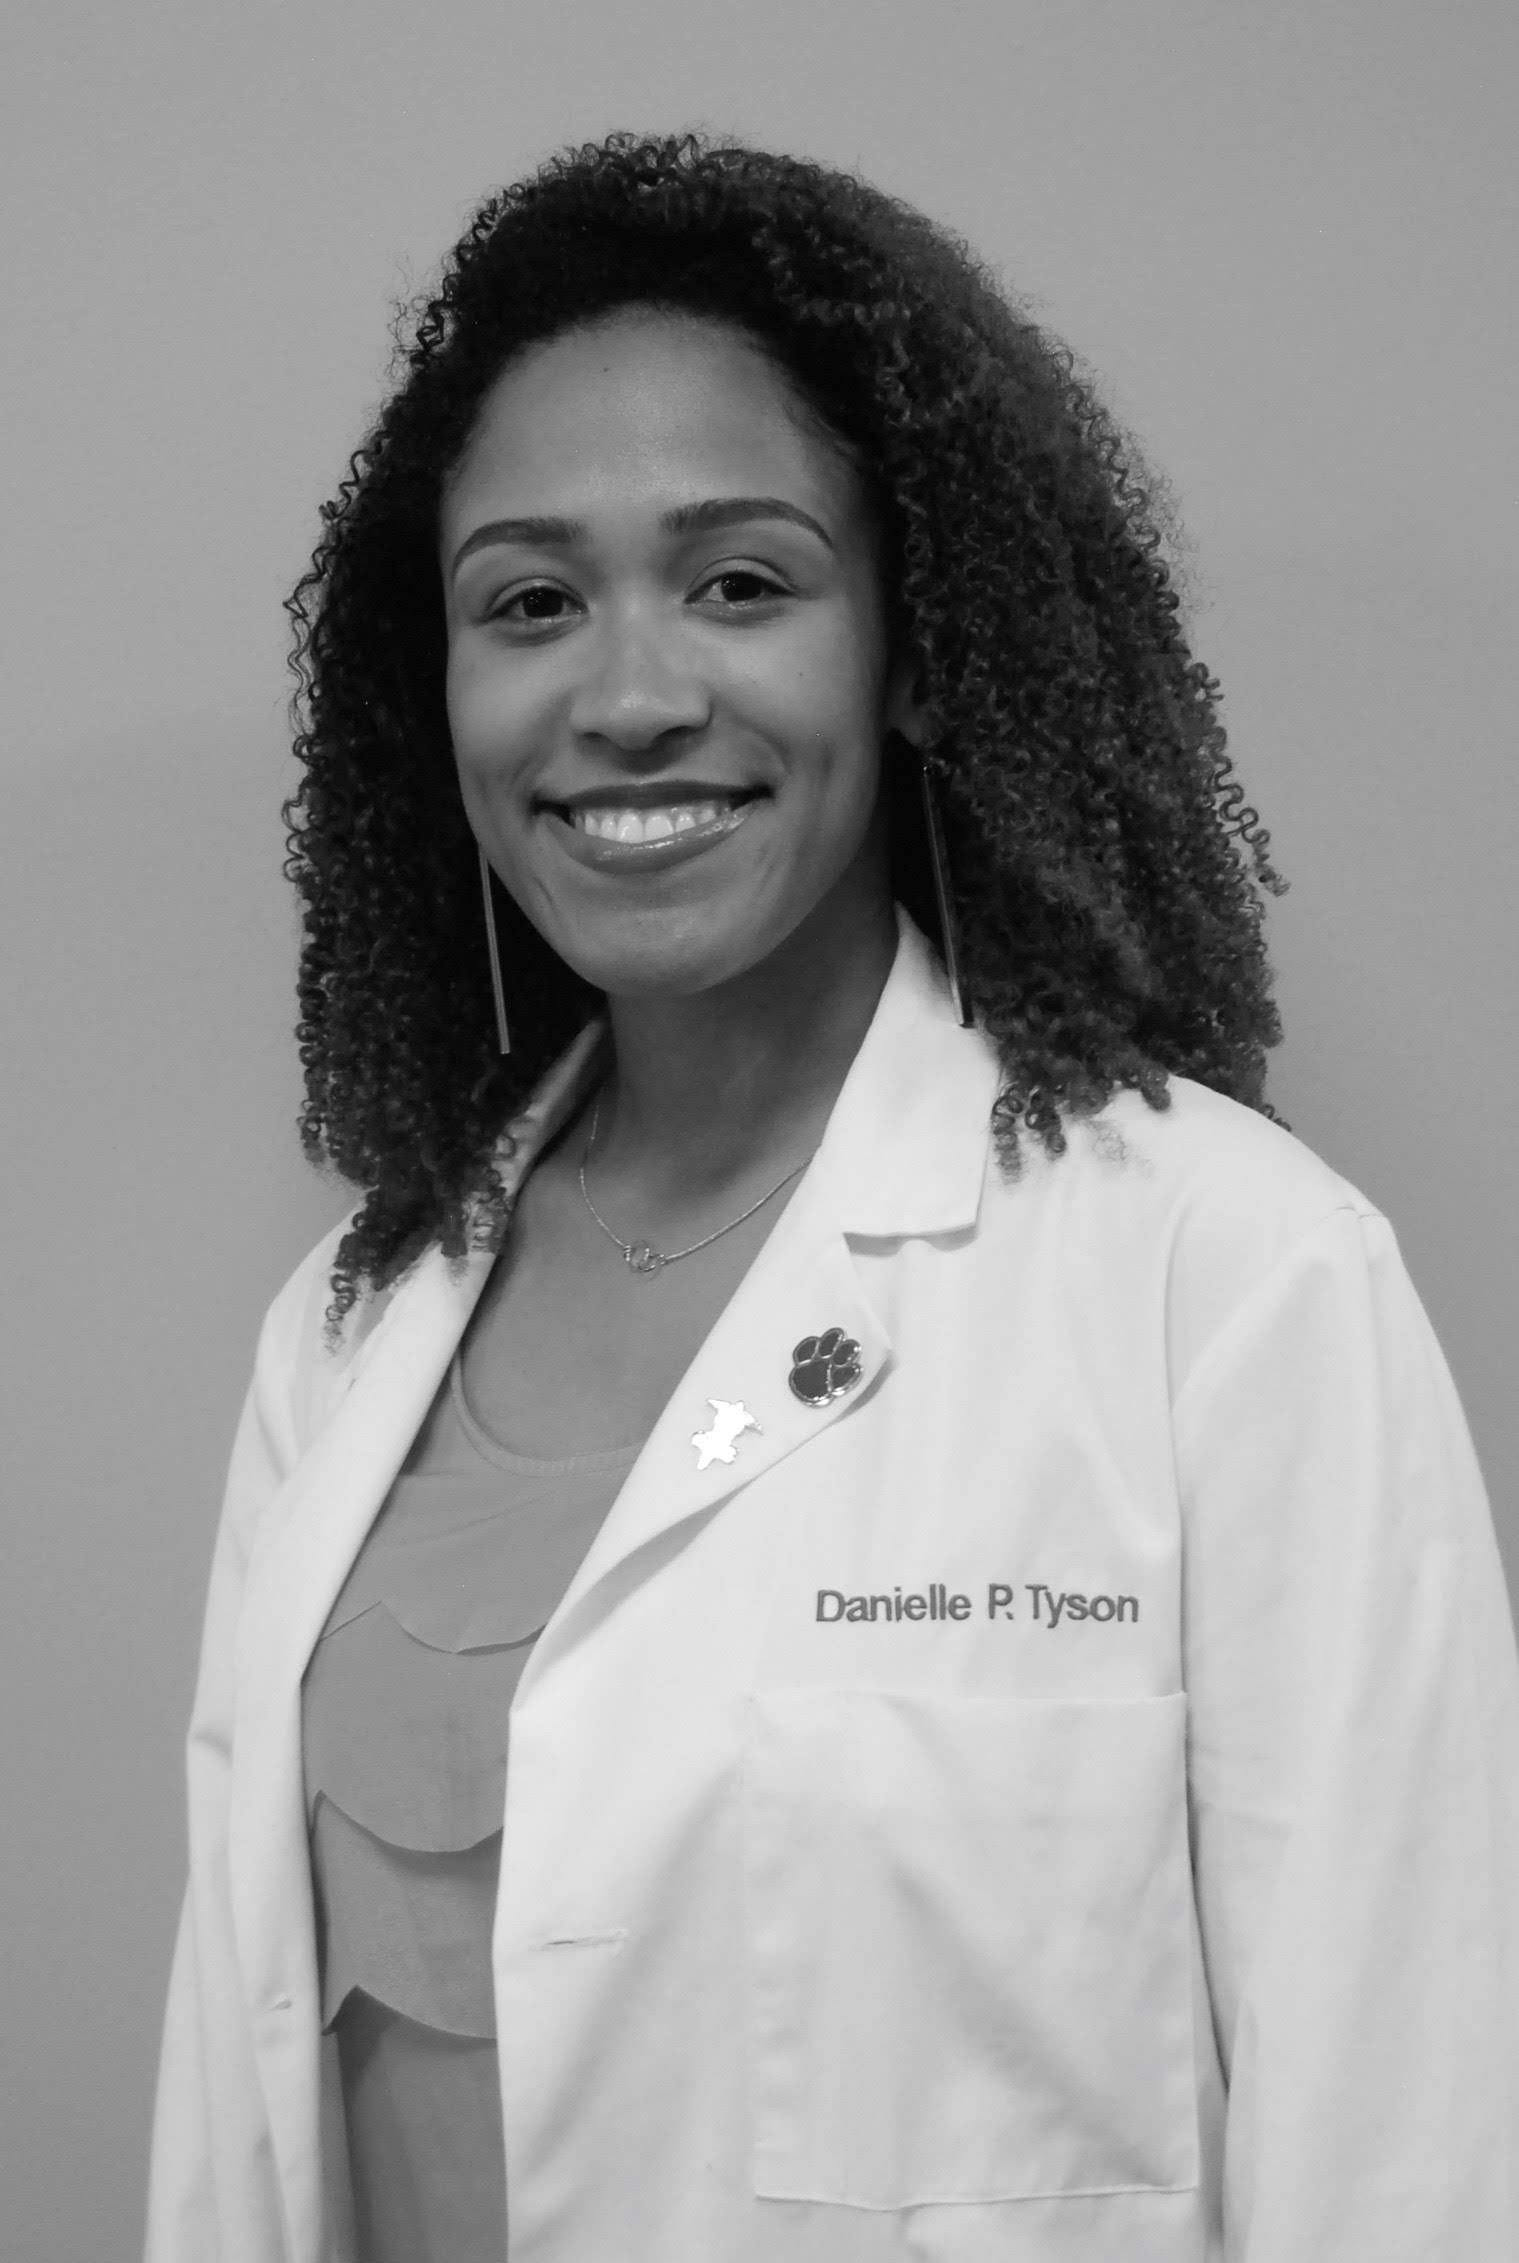 Danielle Tyson